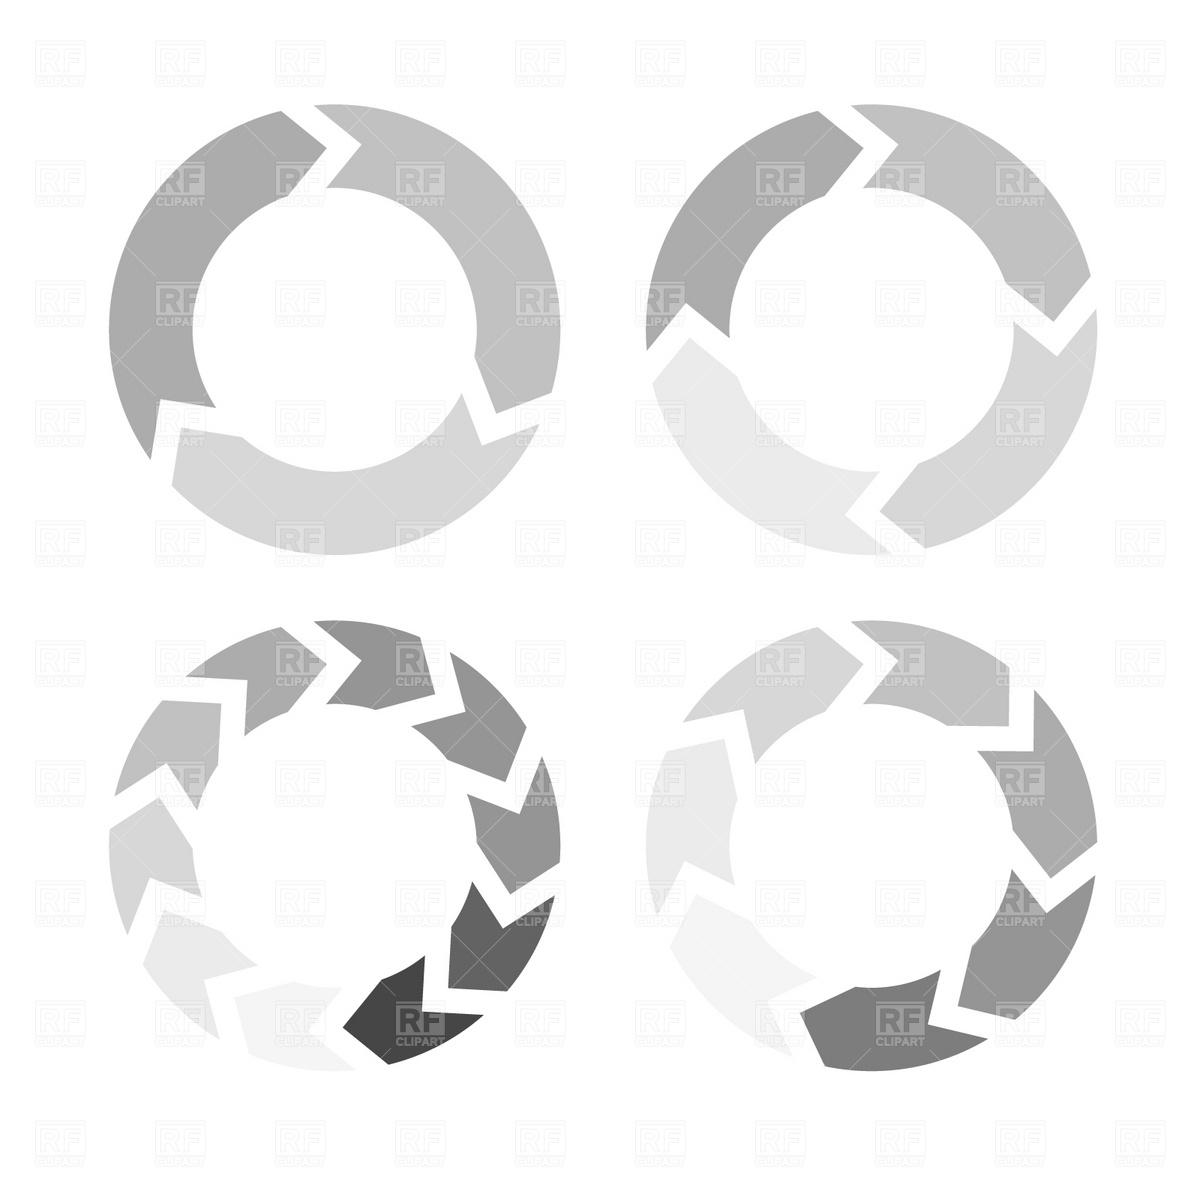 Circle Arrows Clipart - Clipart Kid